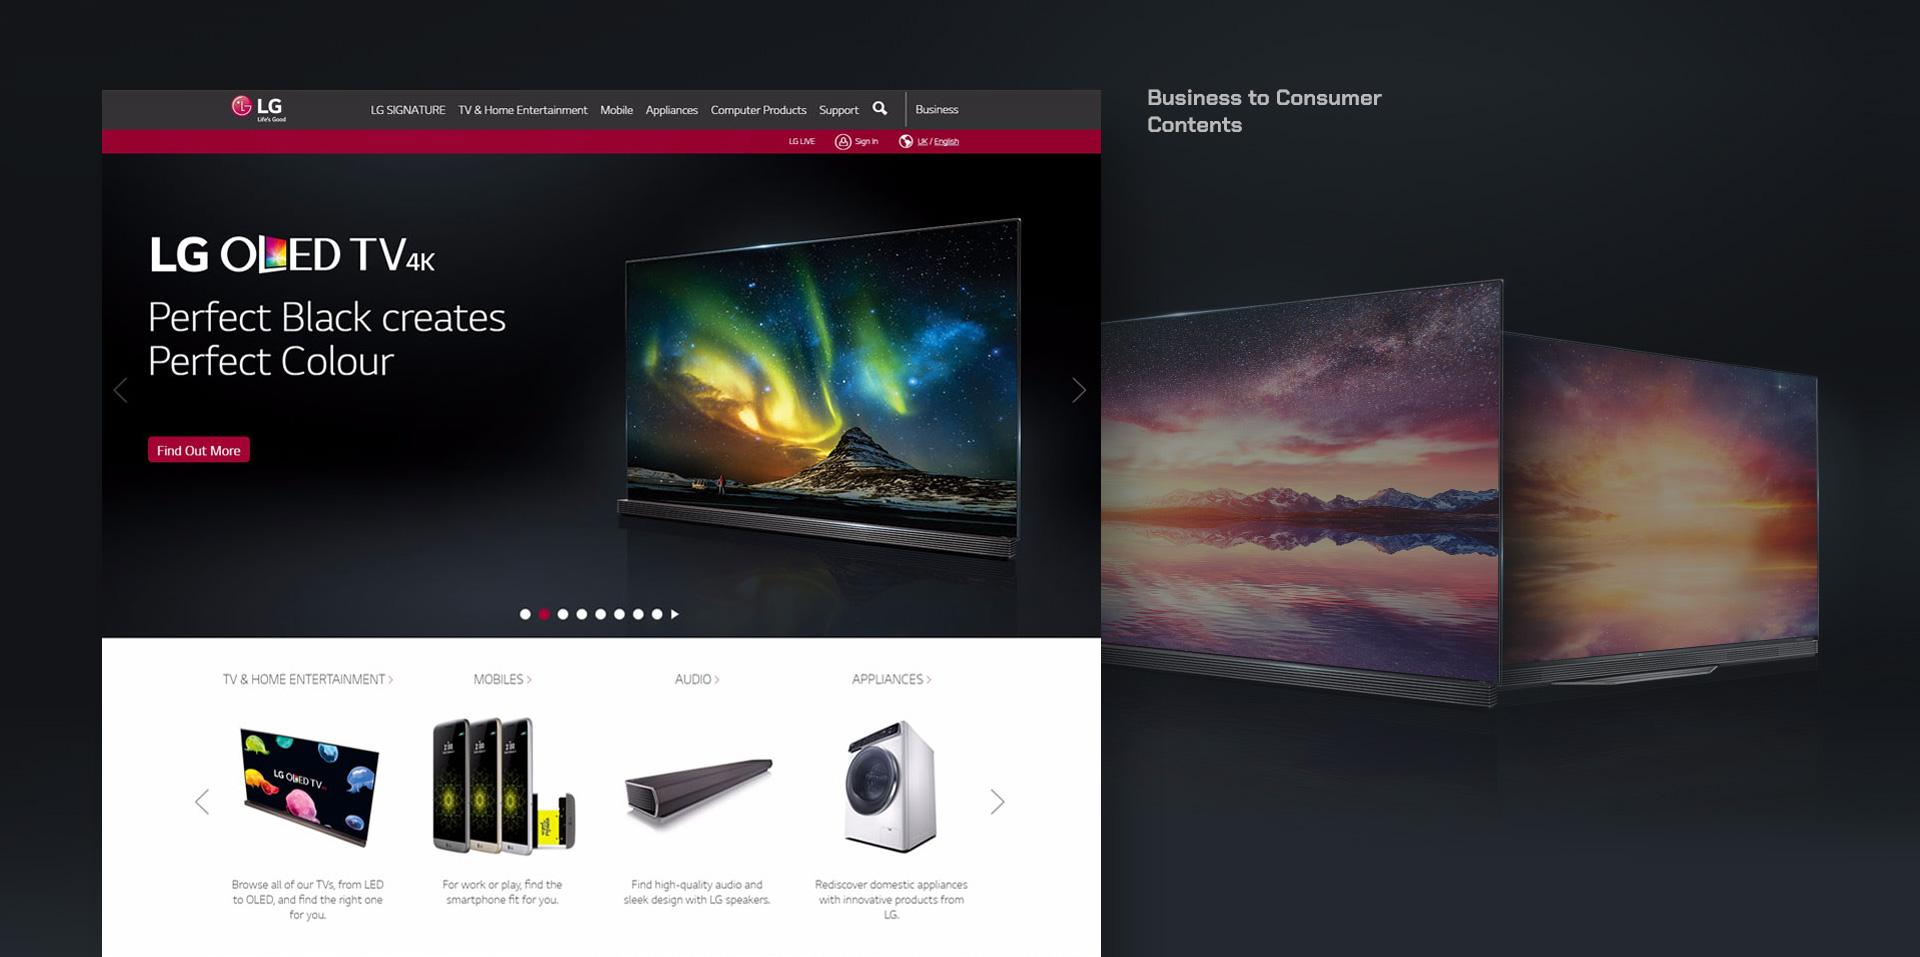 LG com 4 0 Global Rollout - The 51 - digital marketing agency